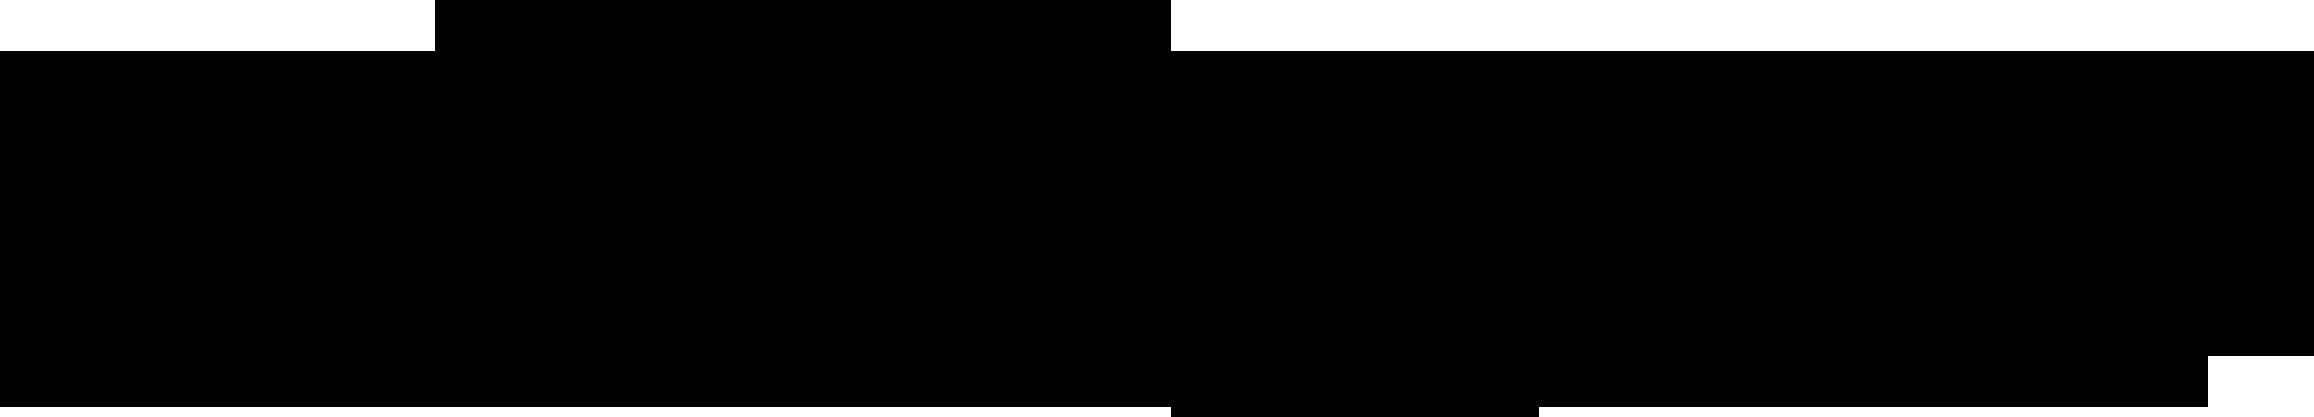 Nikka's Signature